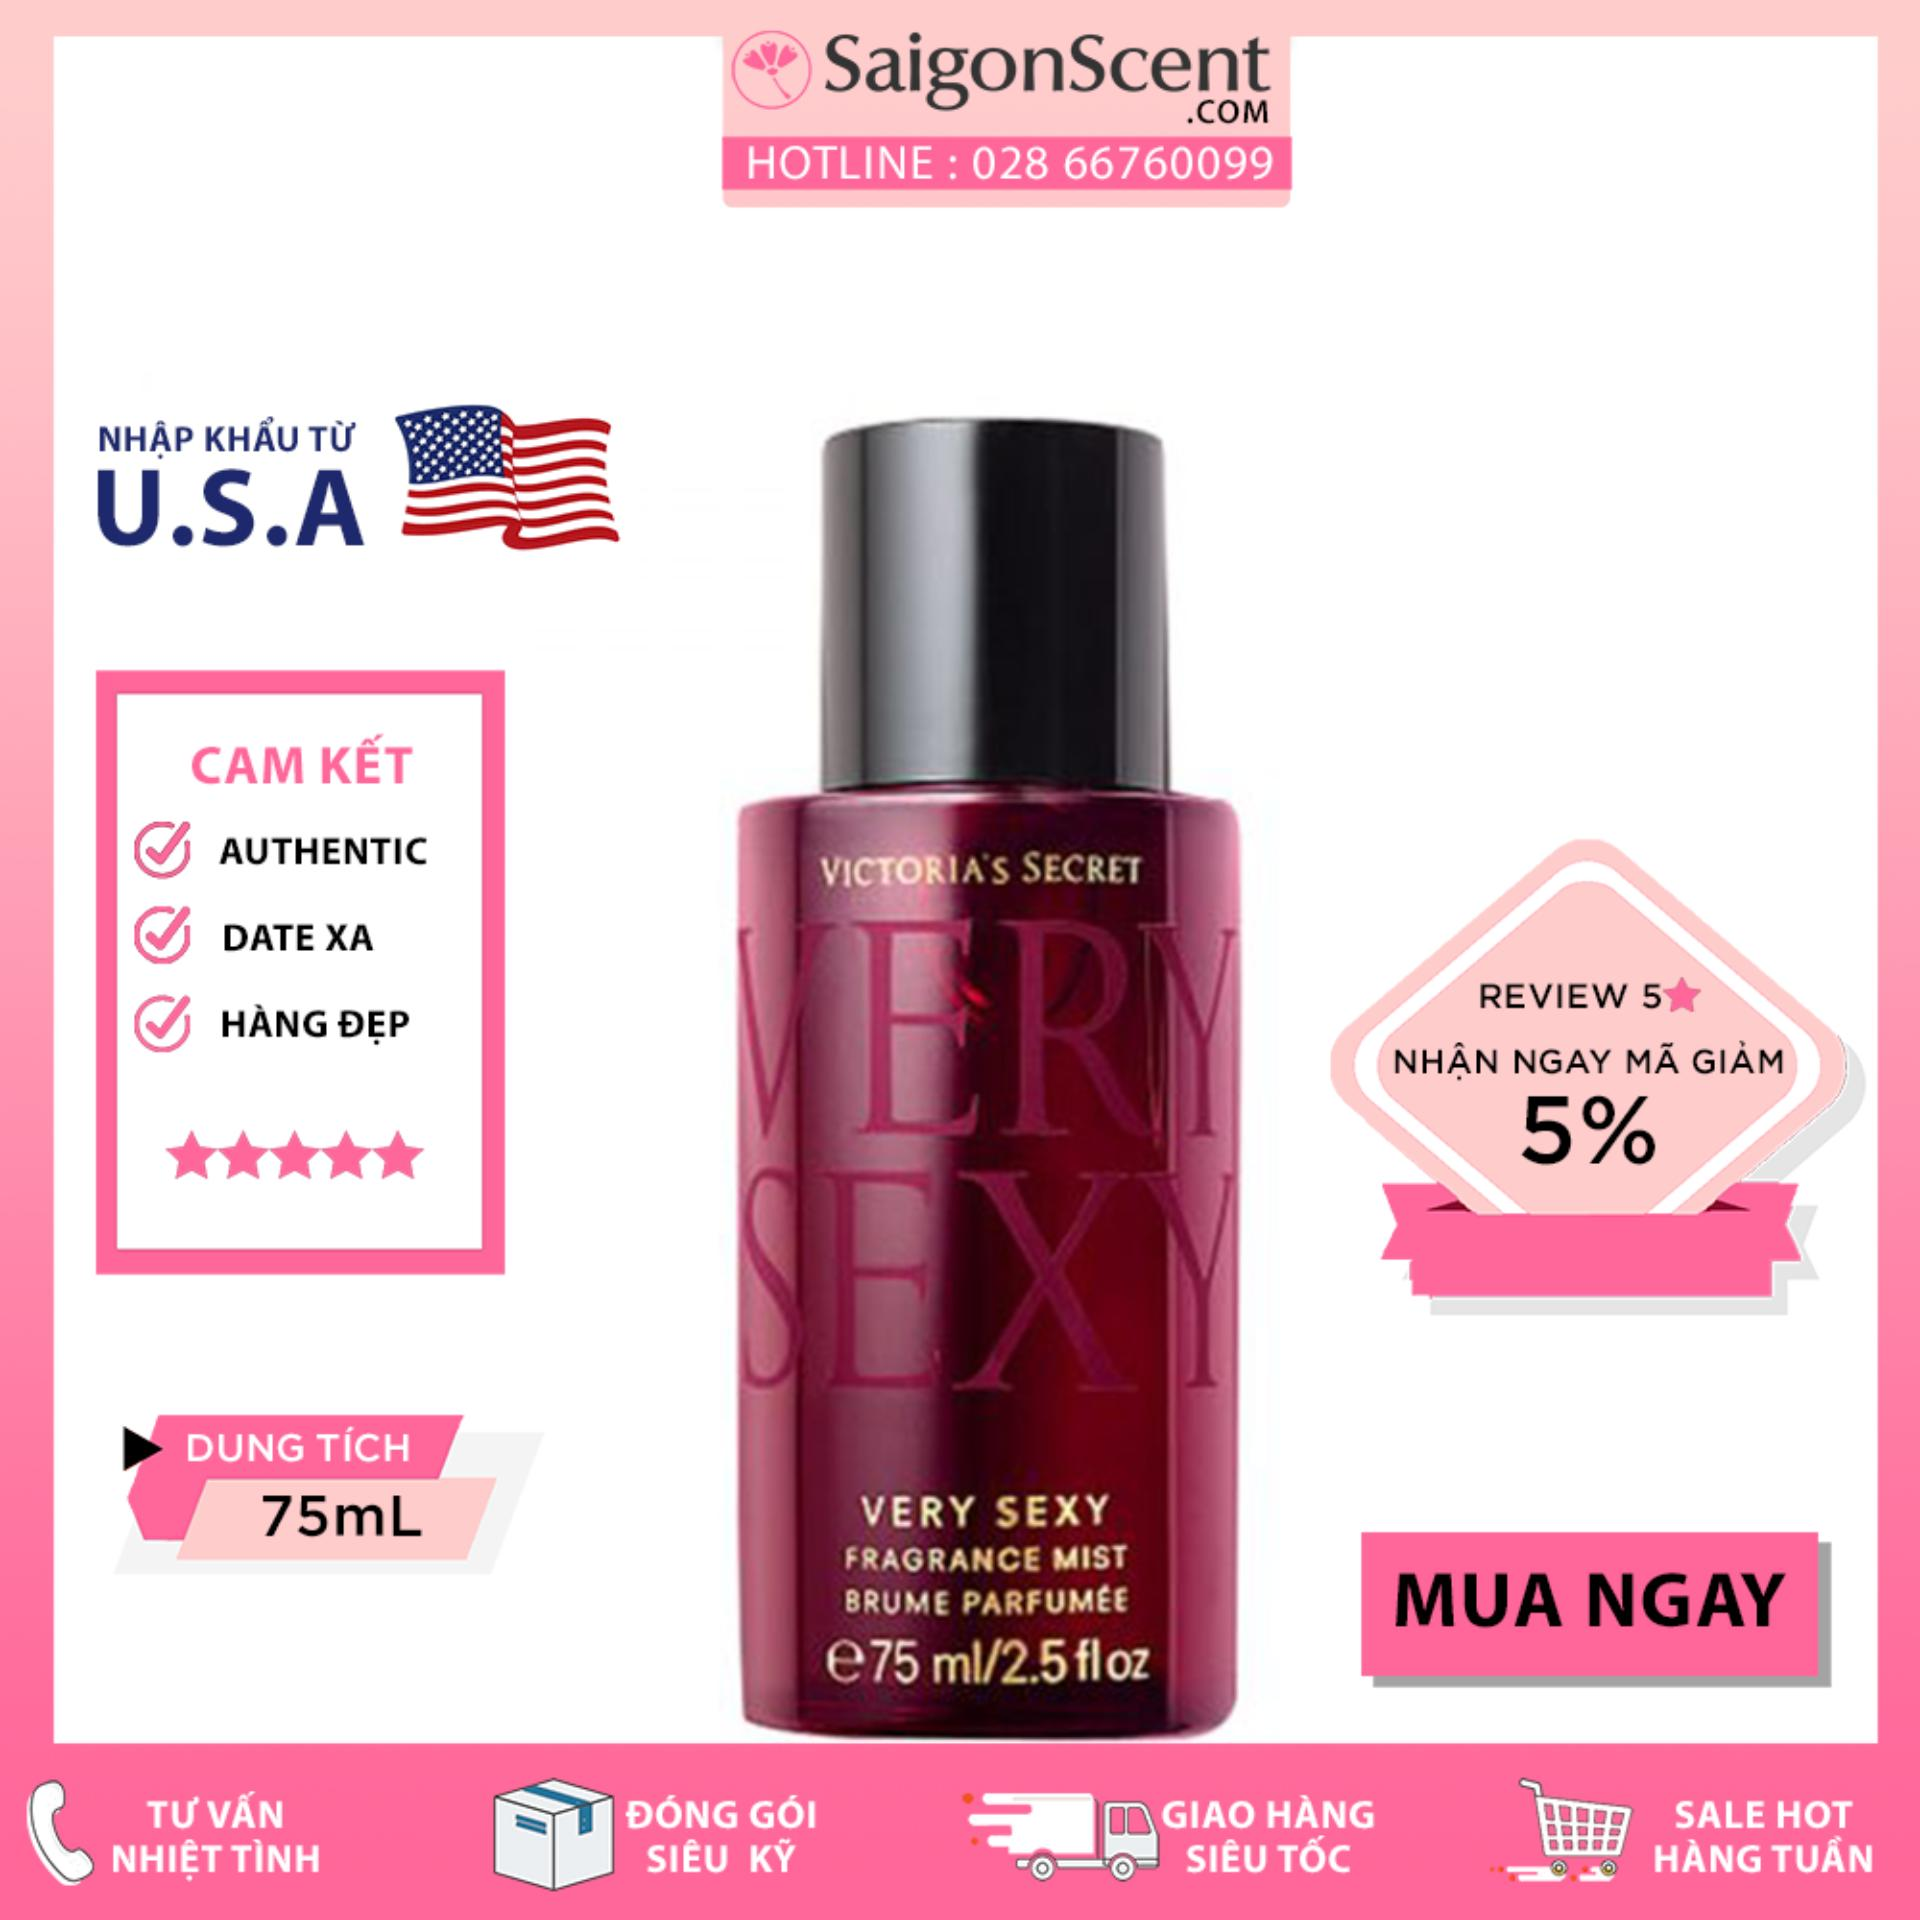 Xịt Thơm Toàn Thân Victoria's Secret Very Sexy Fragrance Mist (75ml)